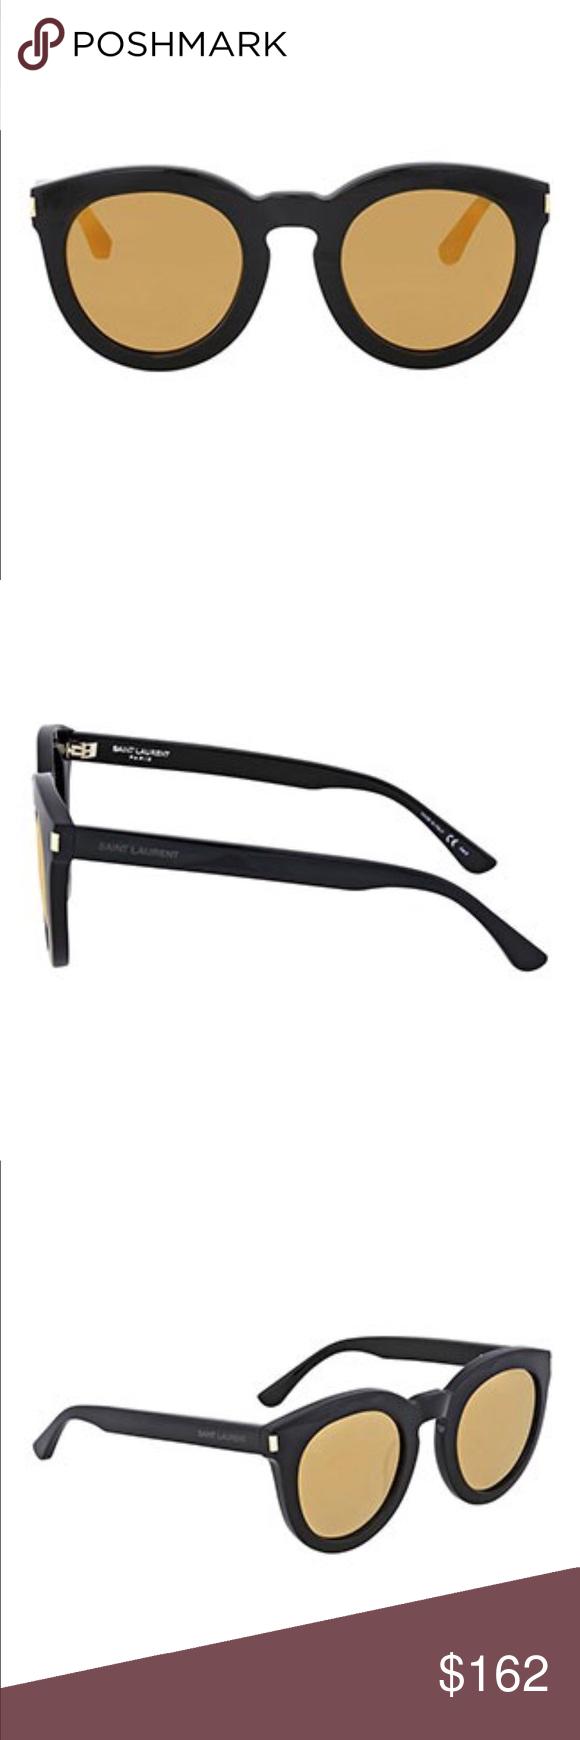 51476b1676b Yves Saint Laurent SL 102 Surf 001 Sunglasses Yves Saint Laurent SL 102  Surf 001 Sunglasses in Black SKU USA-SL-102-SURF-001 Quick overview  • Arm  length  ...